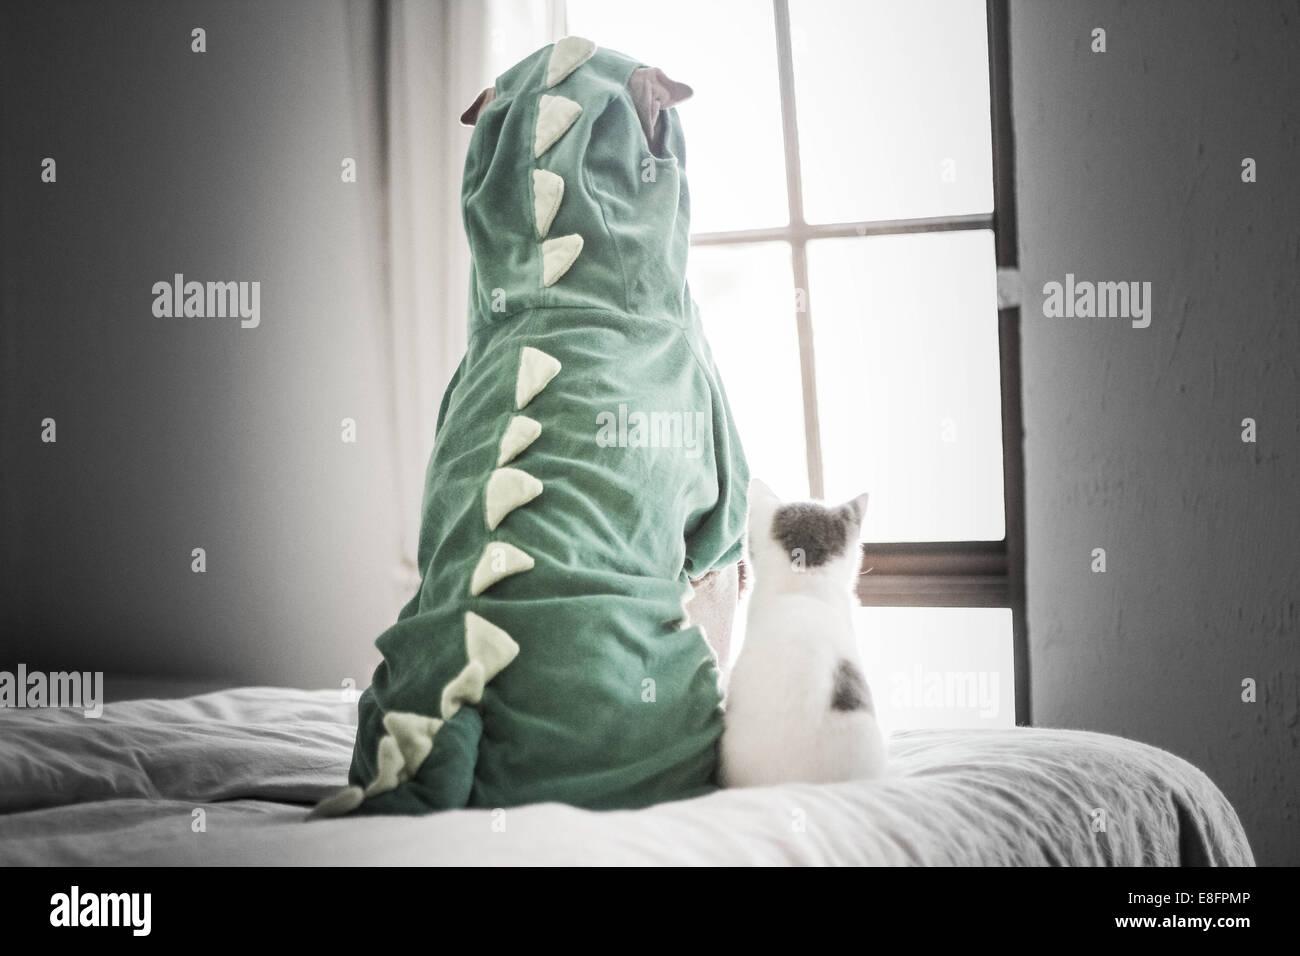 Shar pei in dinosaur costume and kitten looking through window - Stock Image